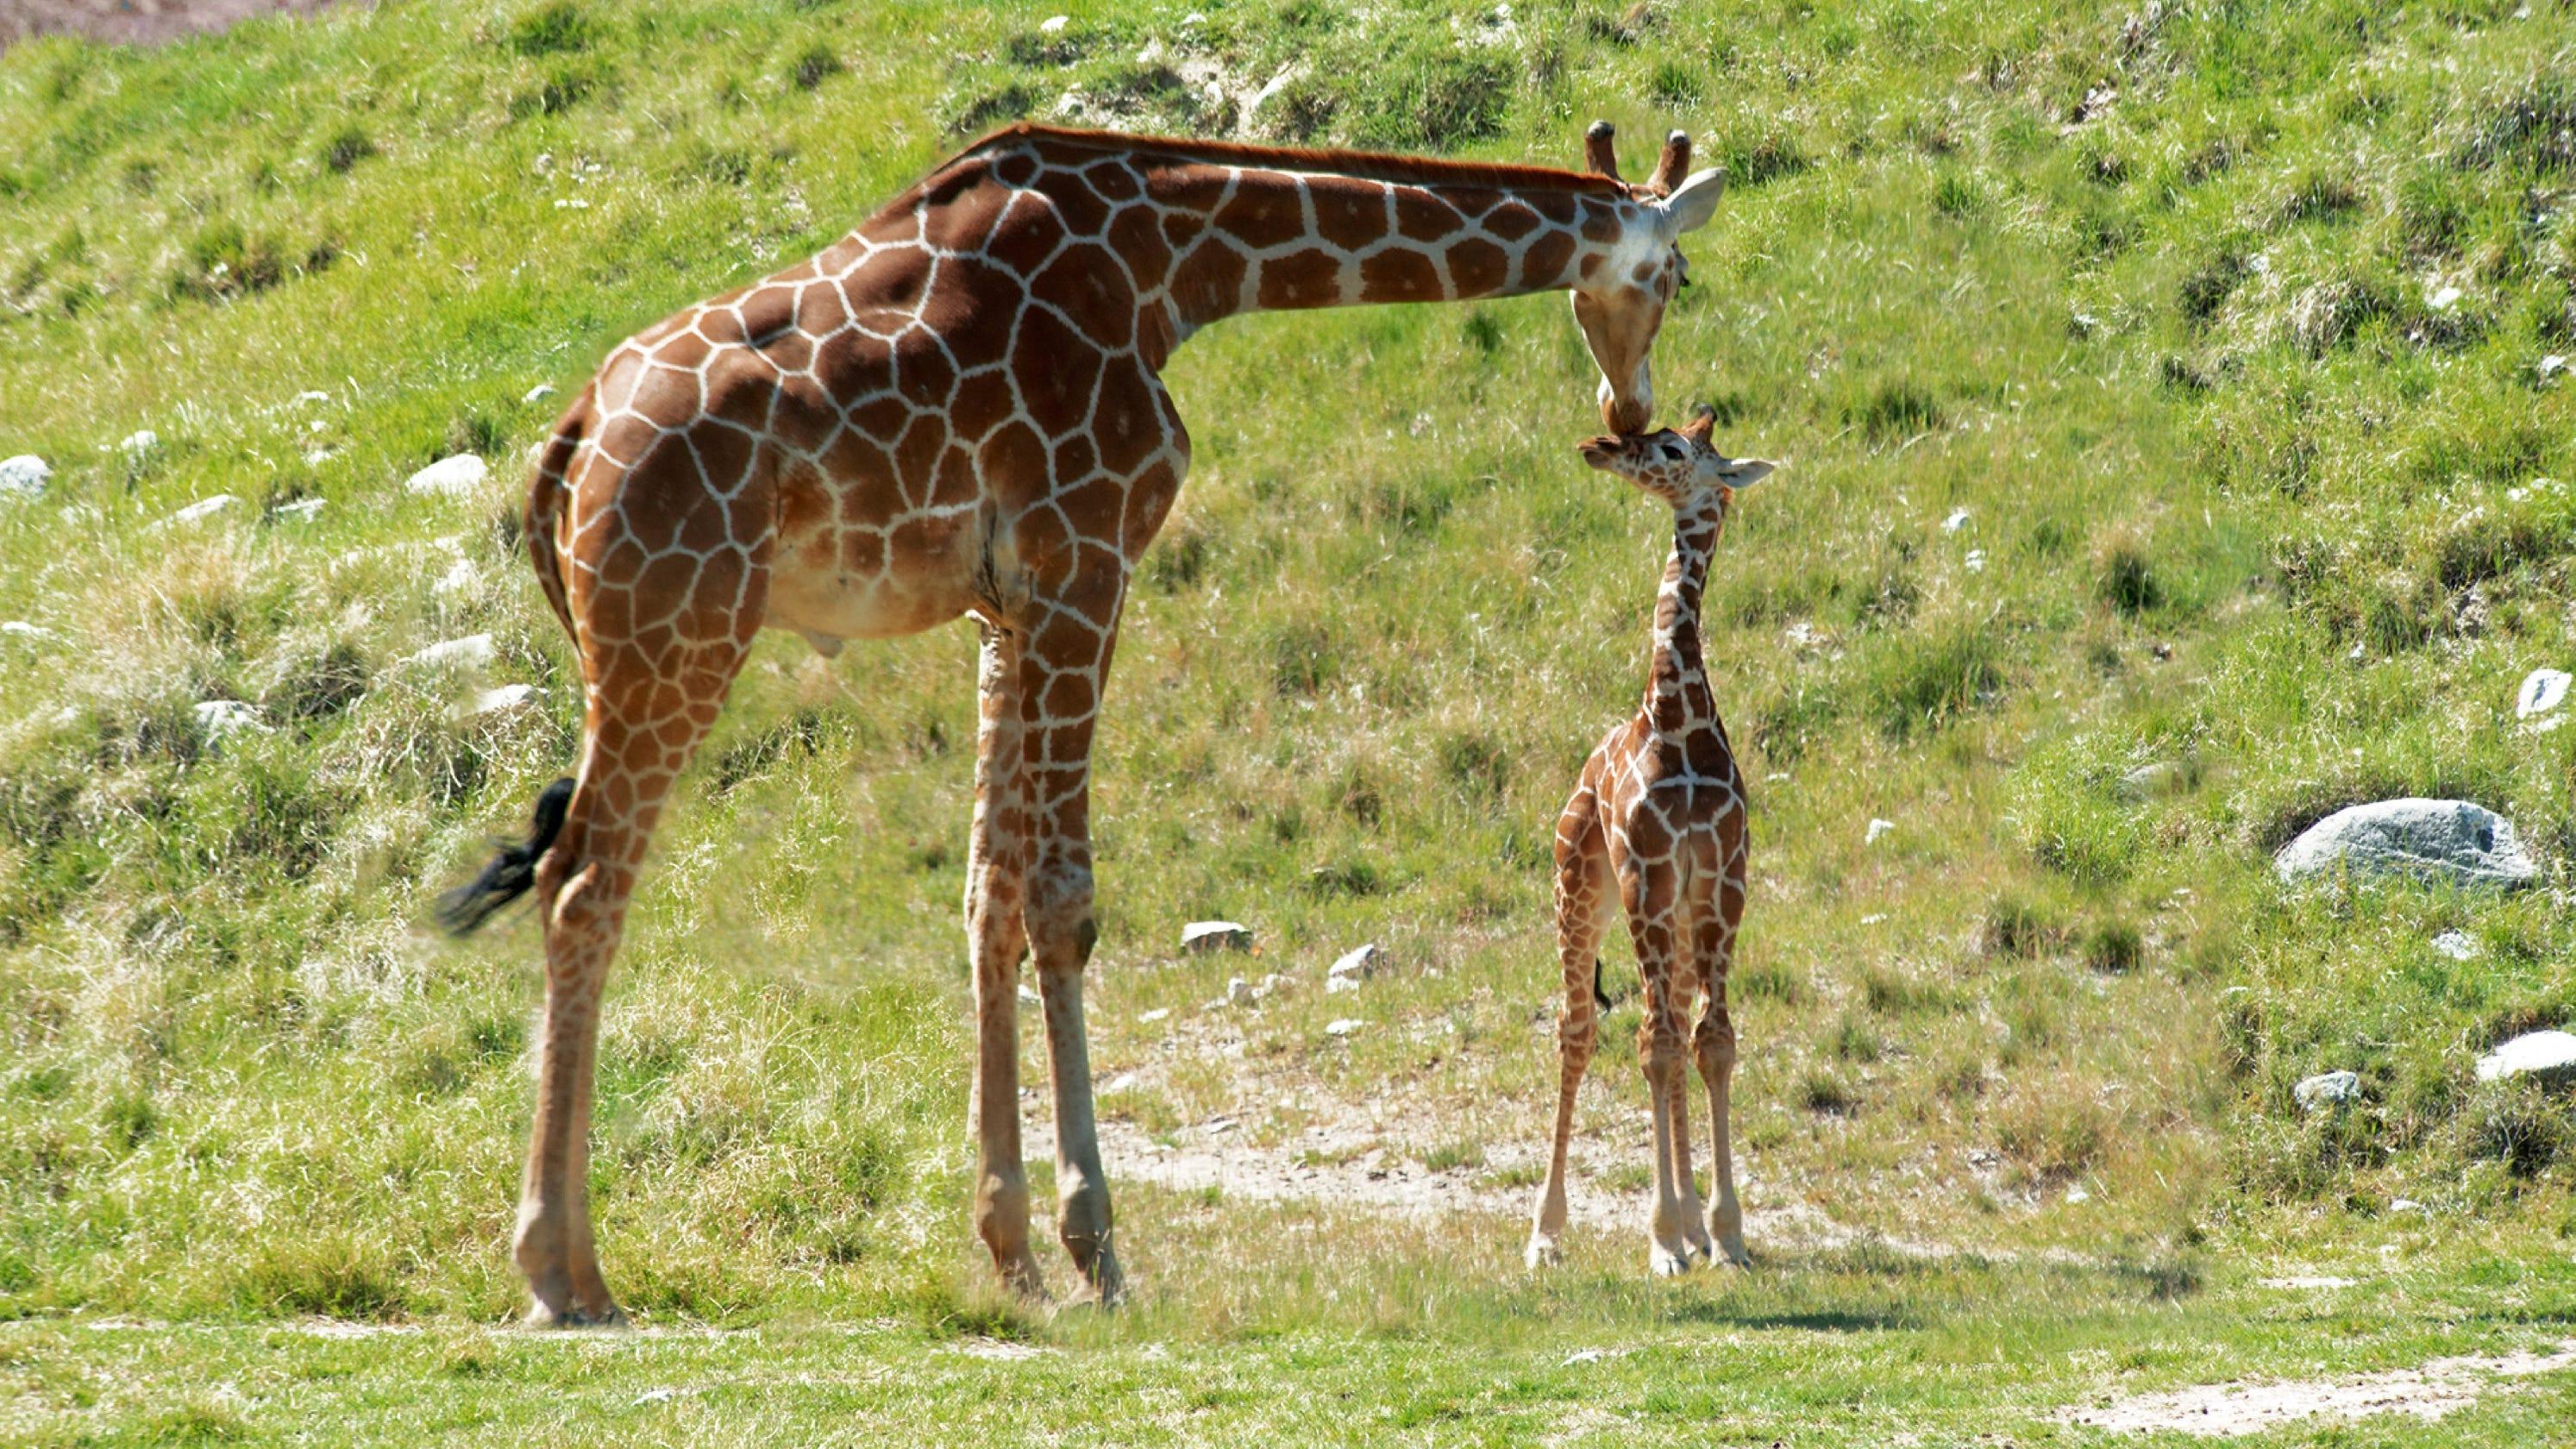 Baby Giraffe At Palm Springs Area Zoo Named Vicki Lou